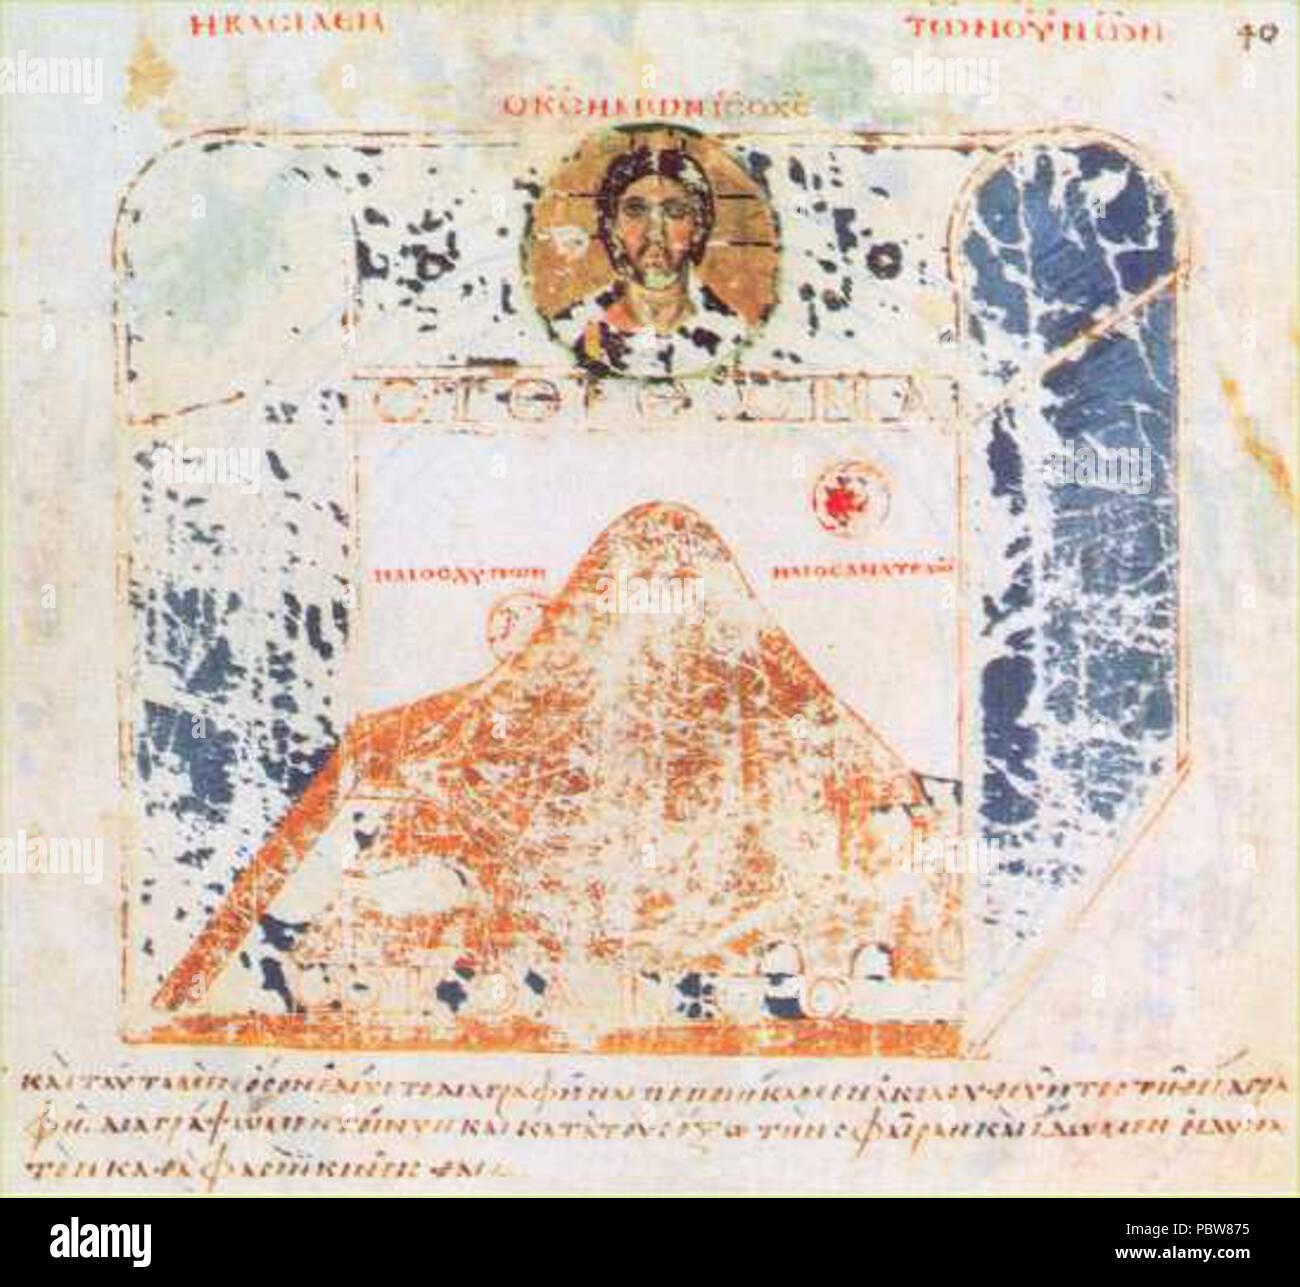 144 Cosmas Indicopleustes - Topographia Christiana 1 - Stock Image